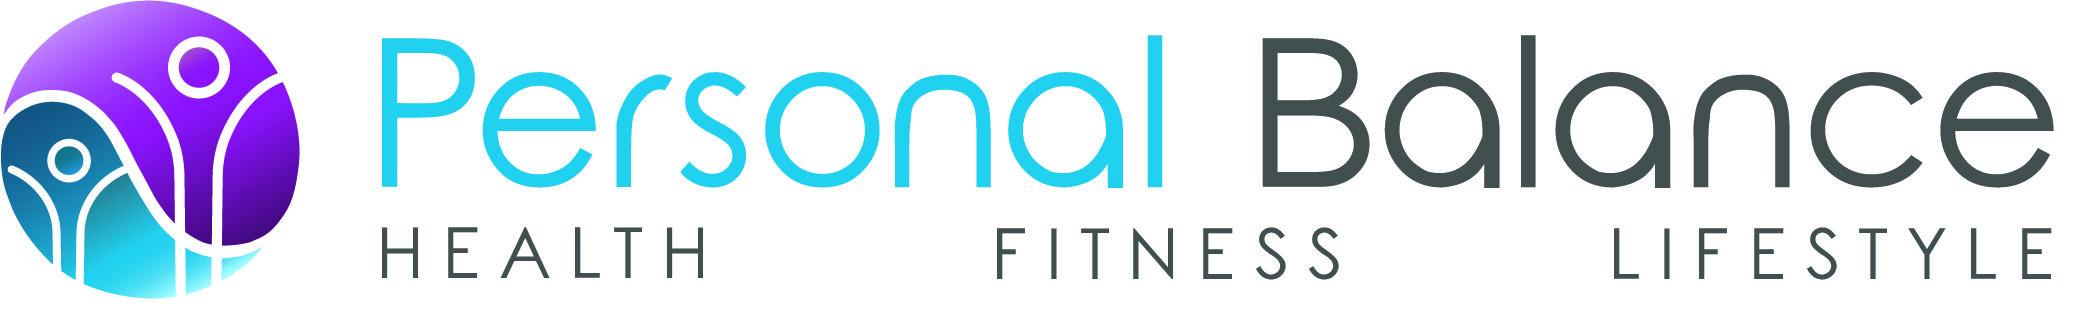 Pre Natal and Post Natal Fitness – Personal Balance